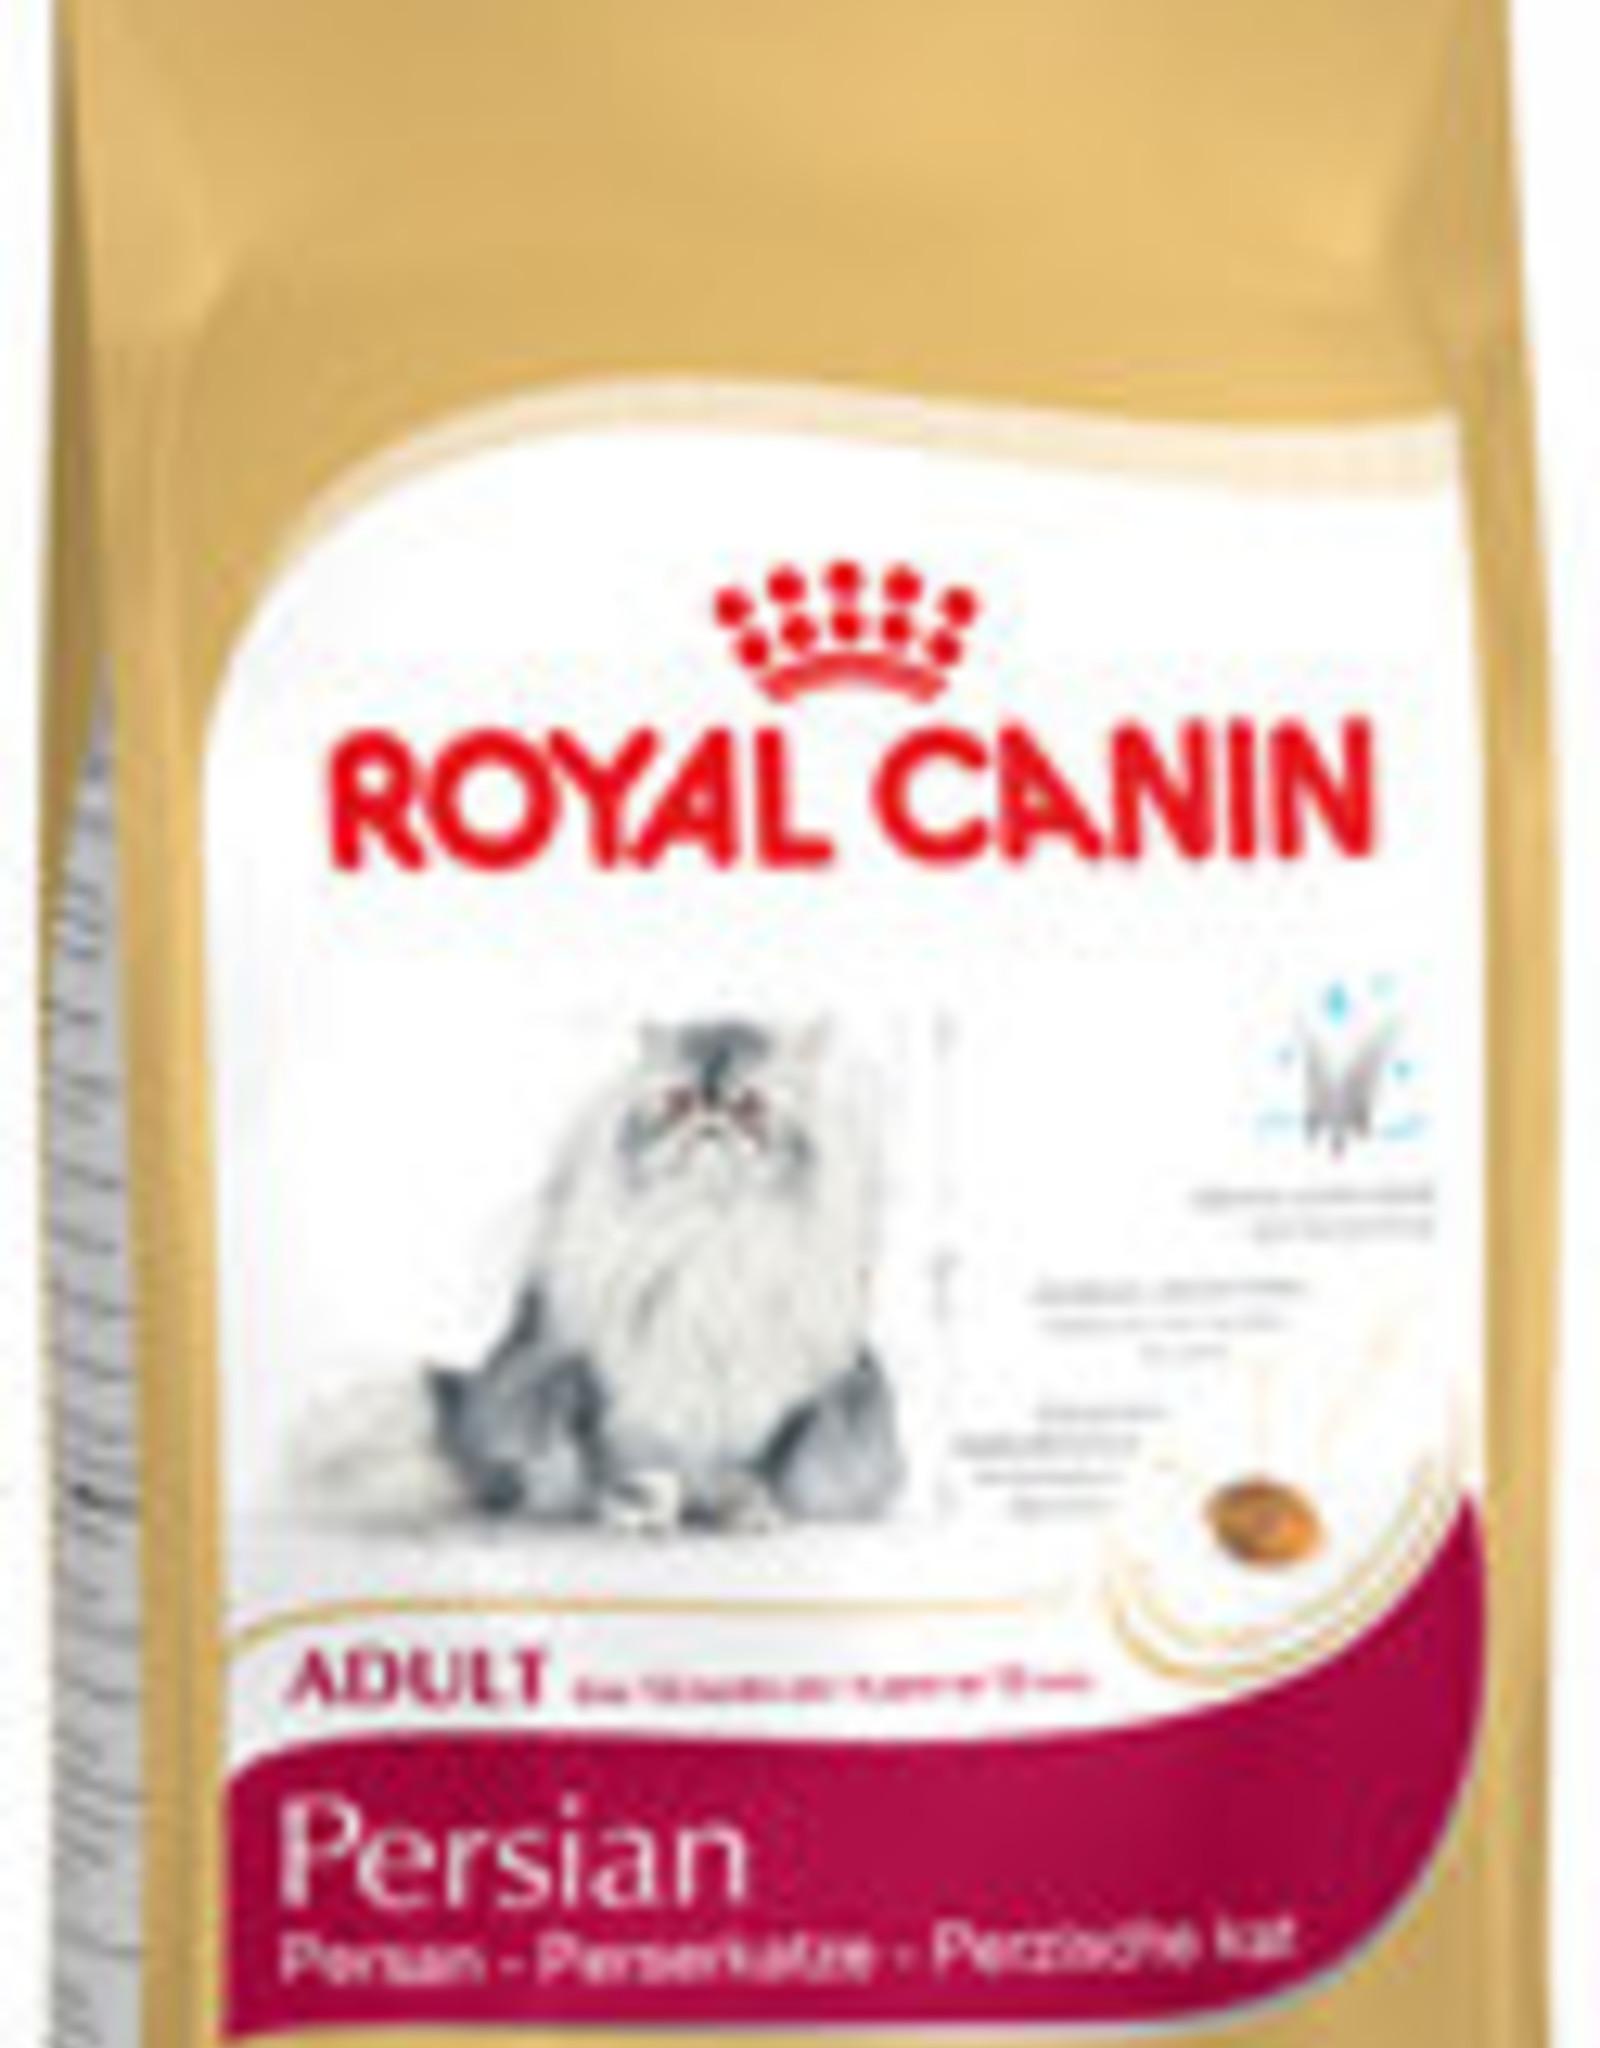 Royal Canin Royal Canin Fbn Persian 30 2kg